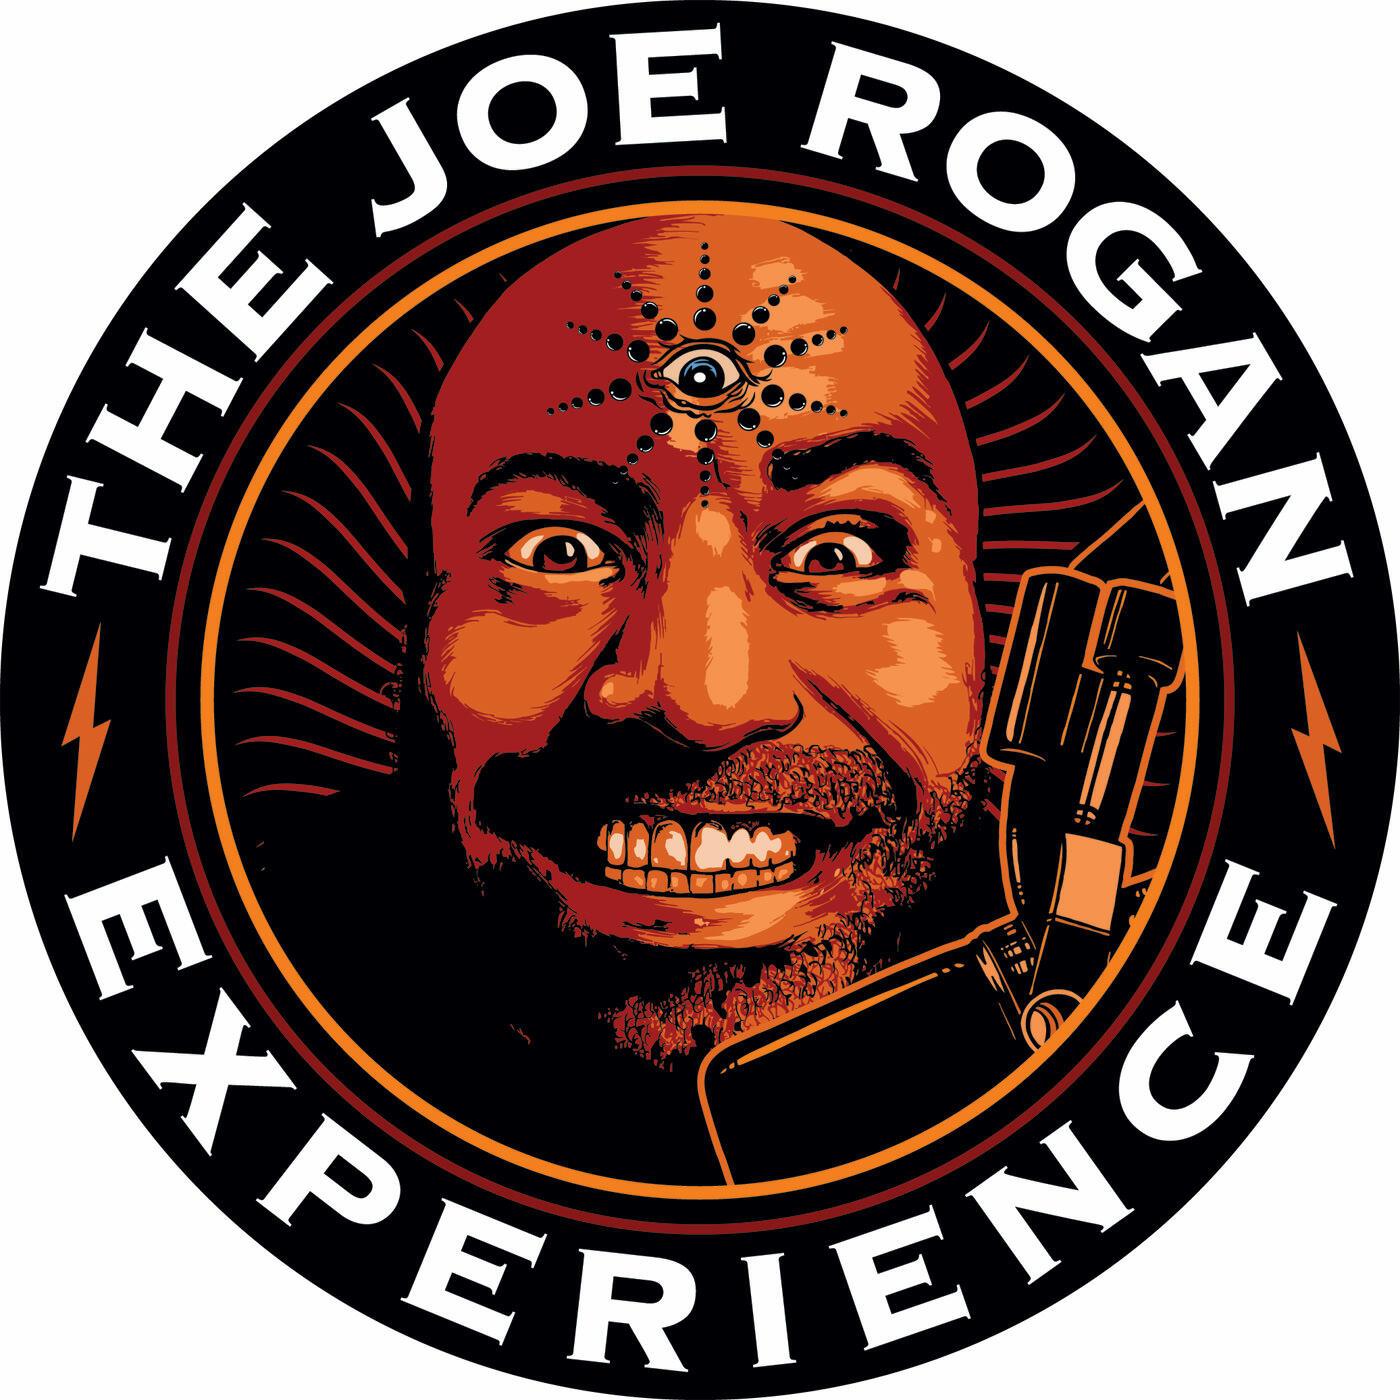 Listen to the The Joe Rogan Experience Episode - #1182 - Nick Kroll on iHeartRadio | iHeartRadio